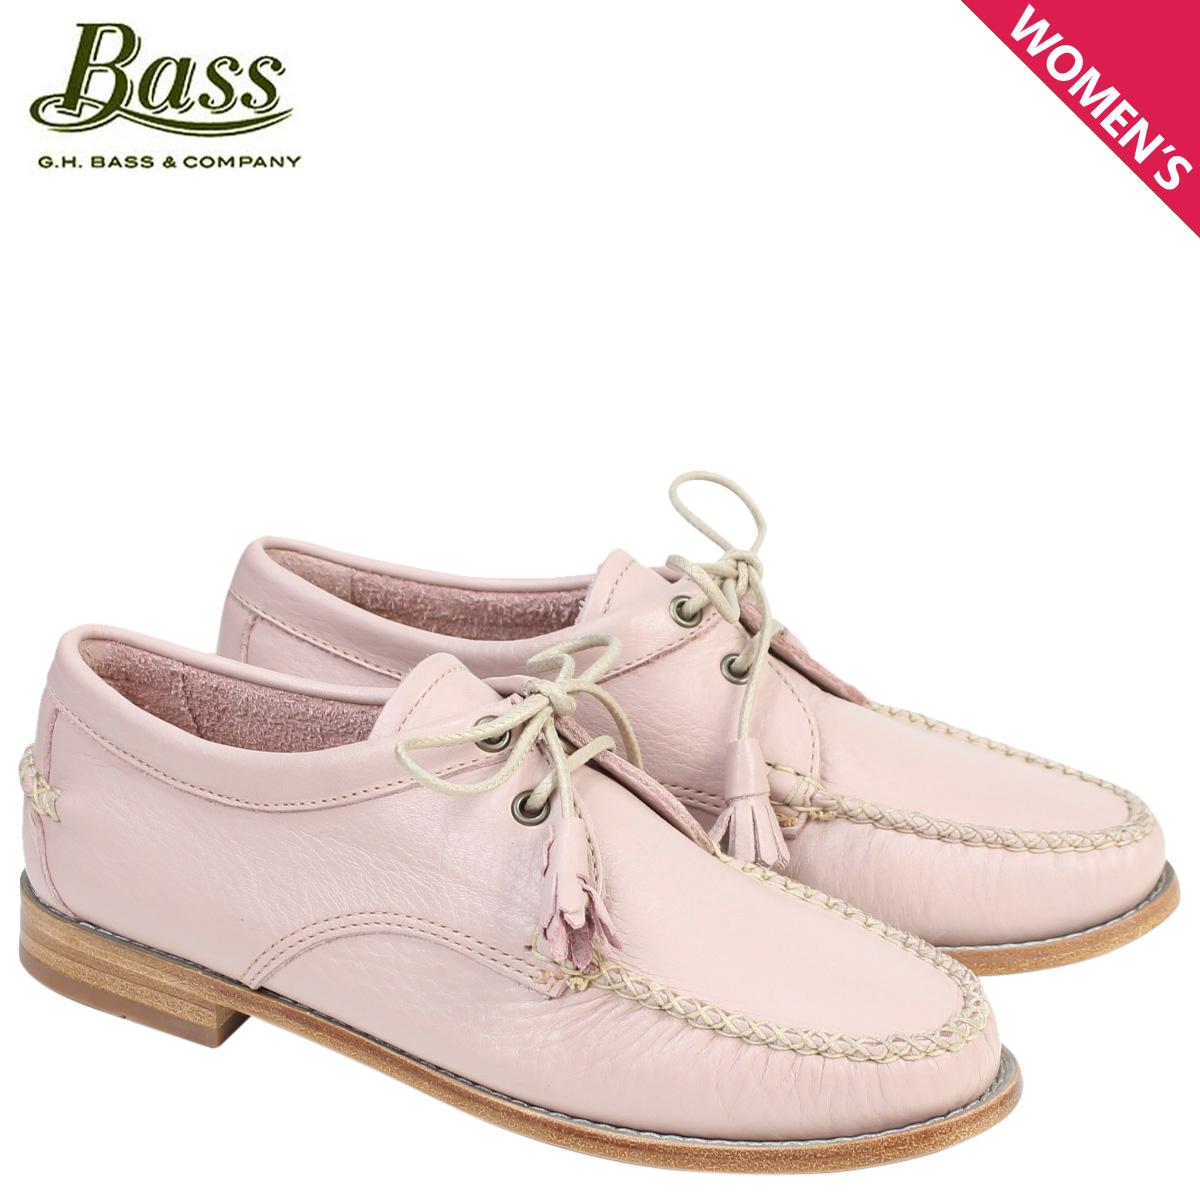 G.H. BASS ローファー ジーエイチバス レディース タッセル WINNIE TIE WEEJUNS 71-22871 ピンク